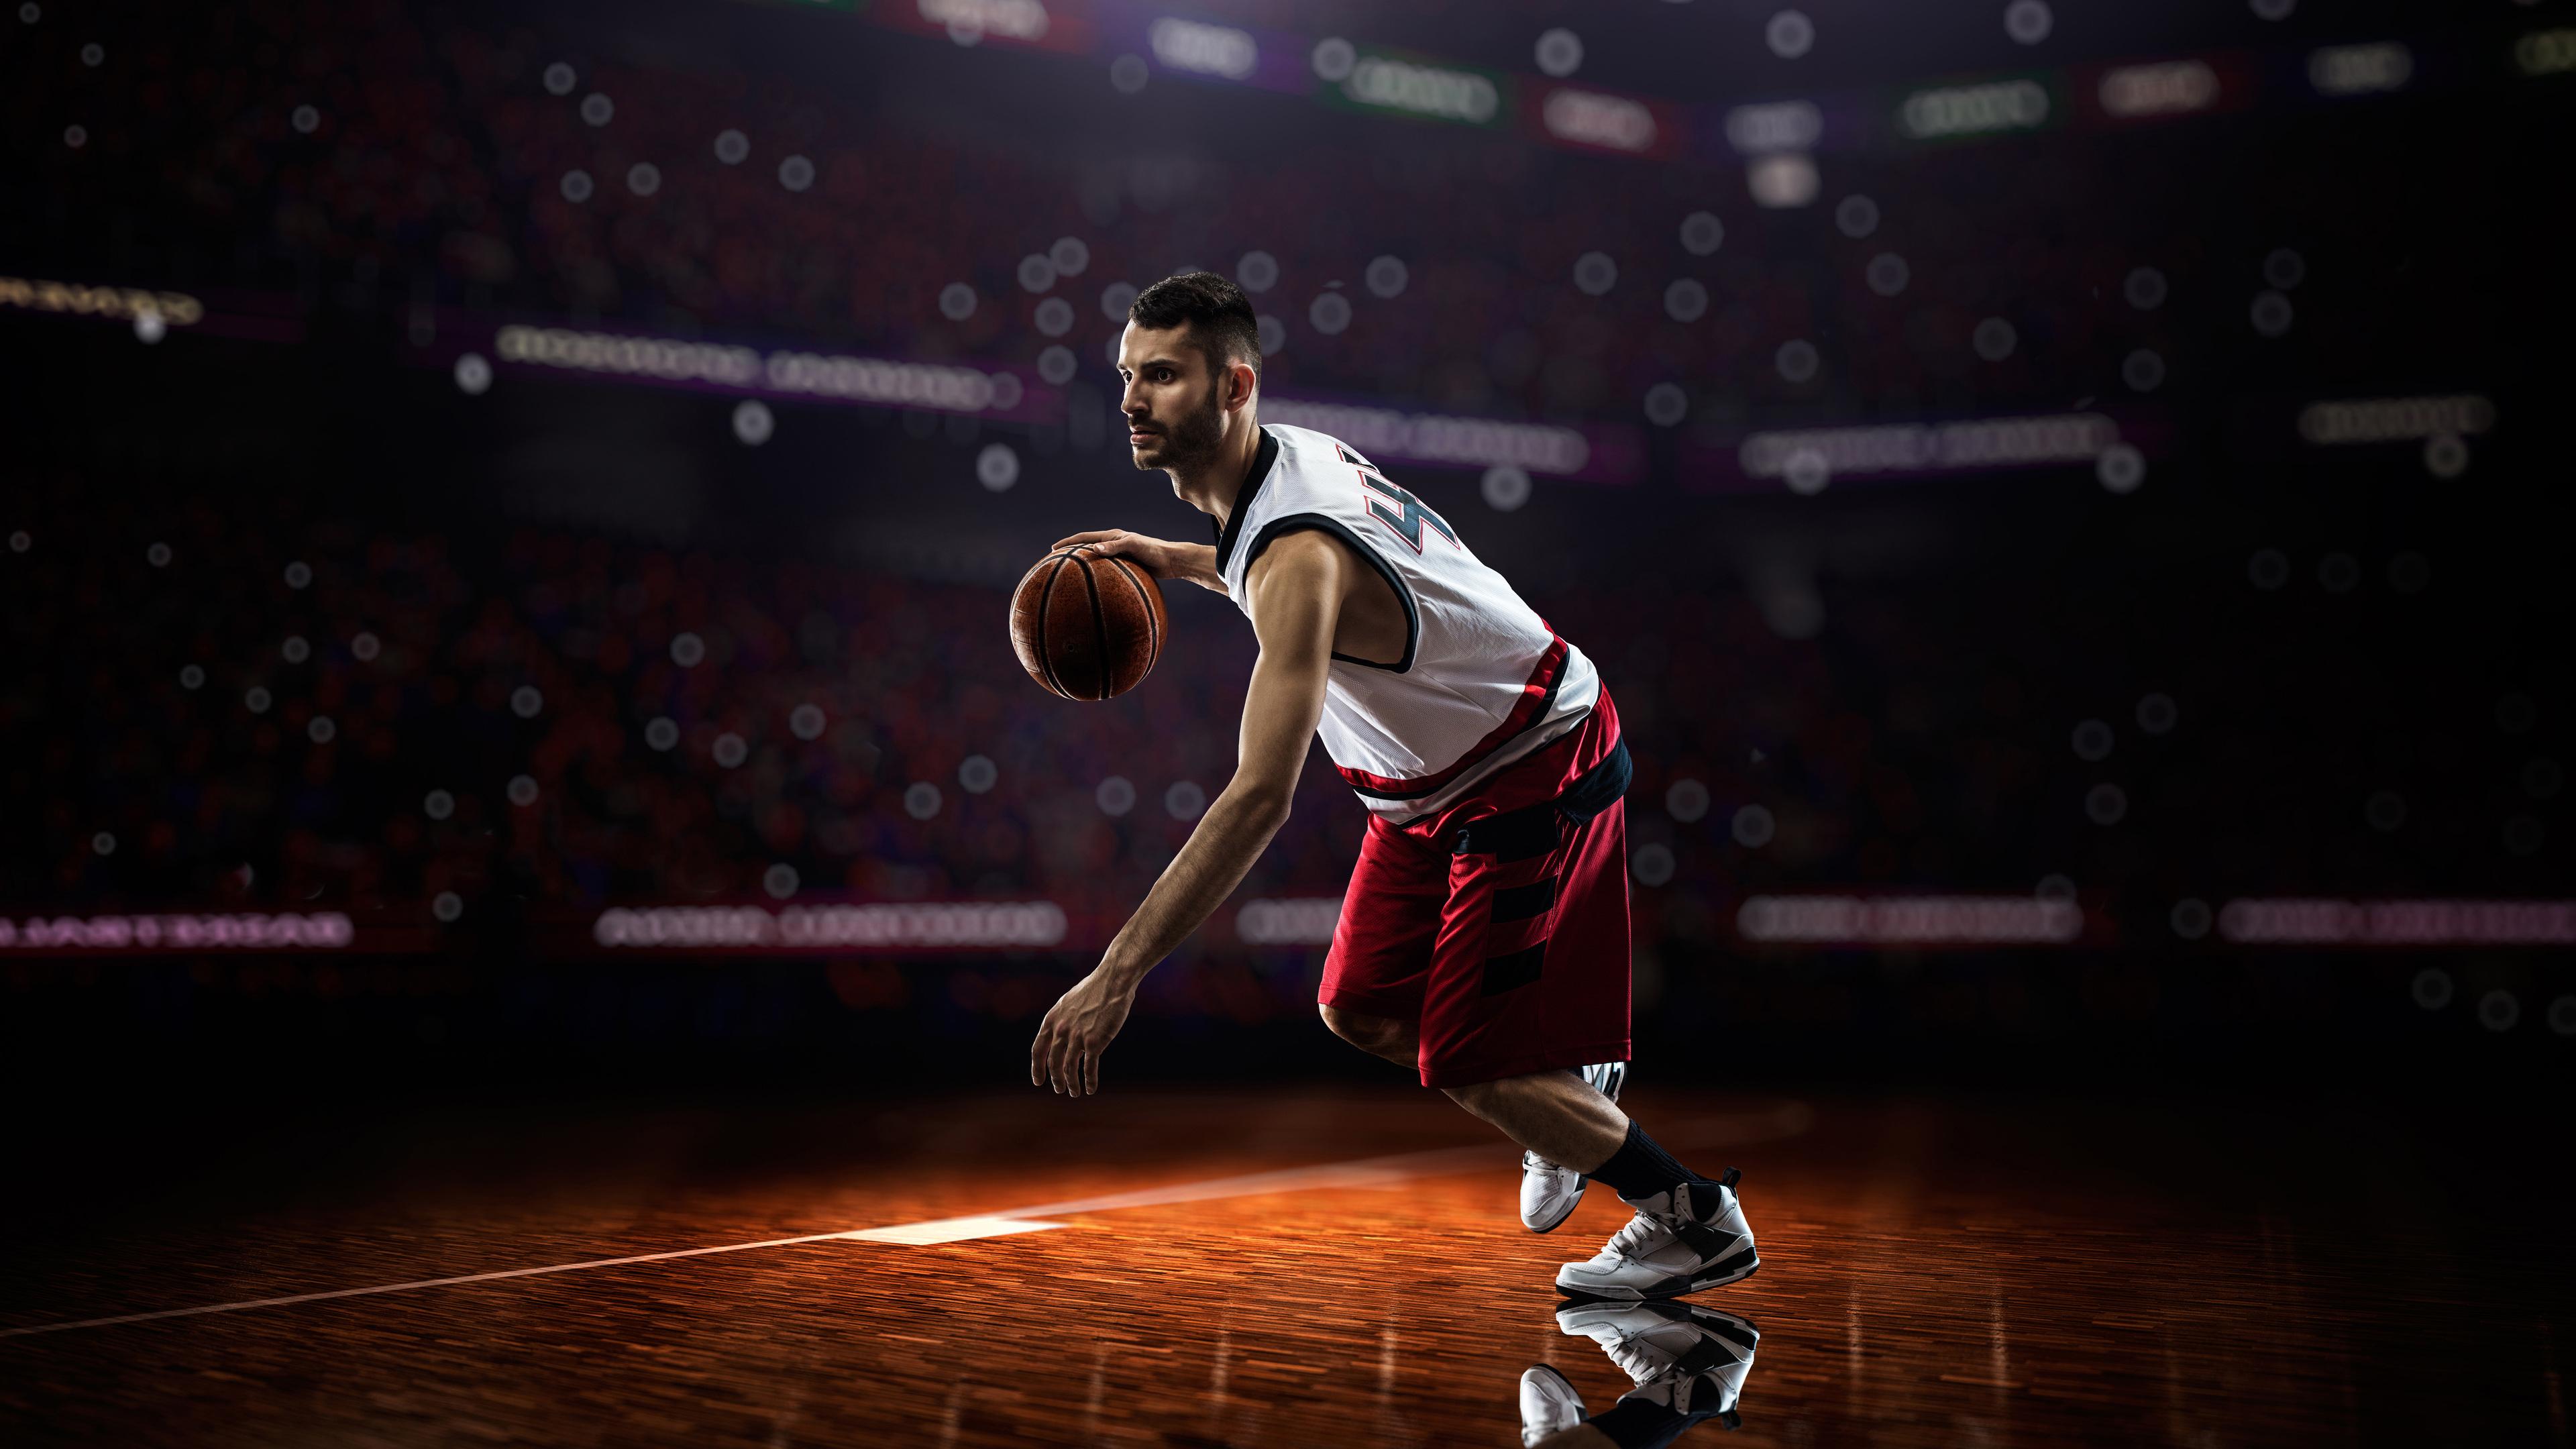 basketball player 8k 1538786816 - Basketball Player 8k - sports wallpapers, hd-wallpapers, basketball wallpapers, 8k wallpapers, 5k wallpapers, 4k-wallpapers